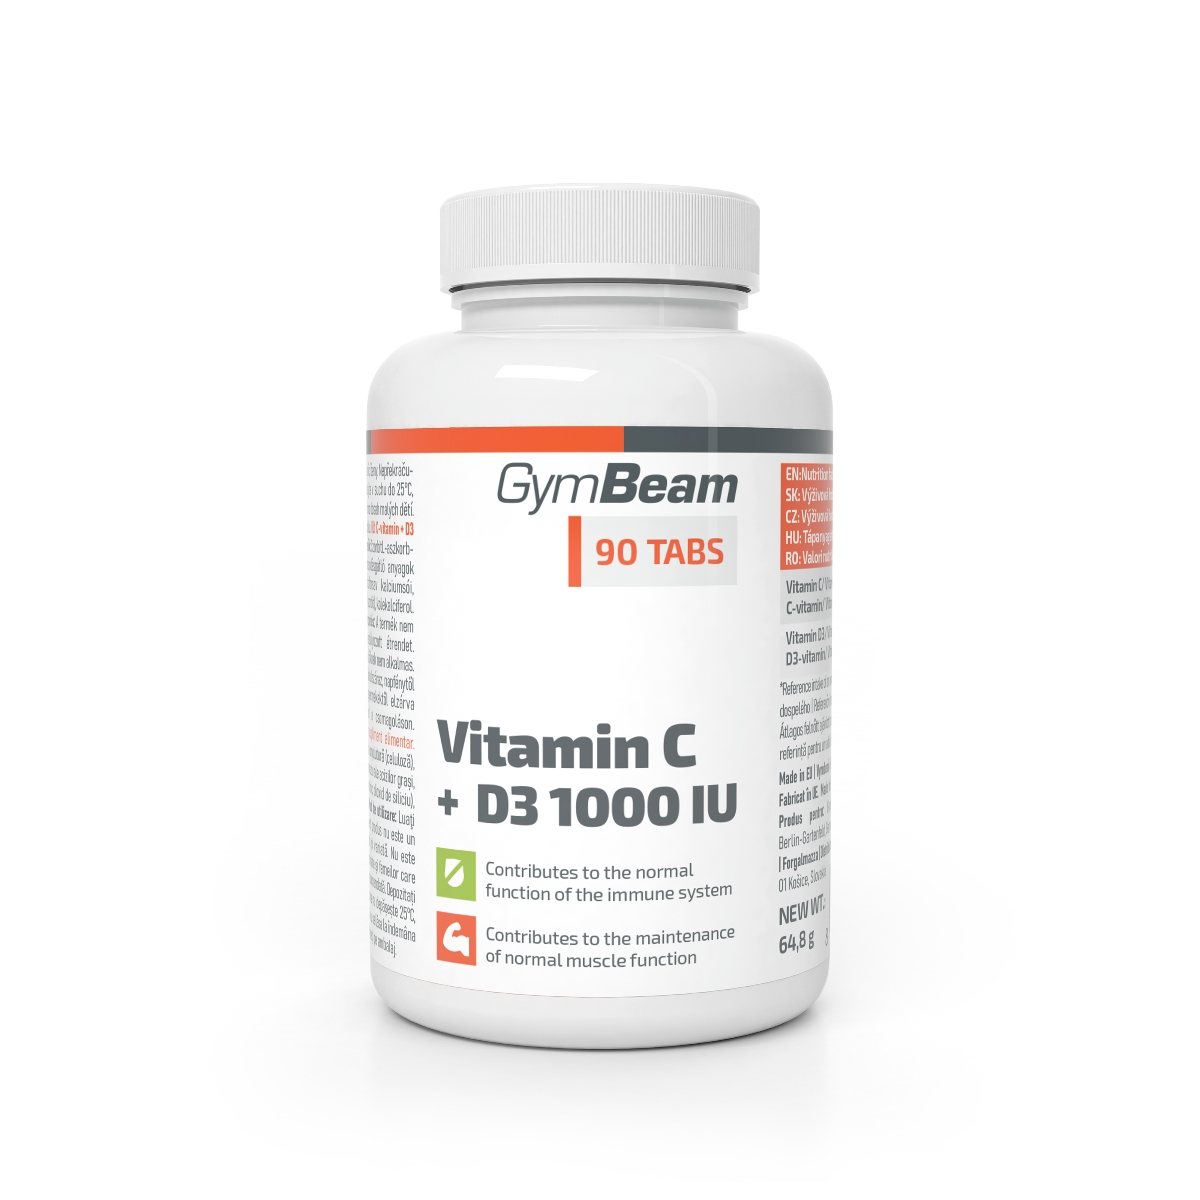 Vitamín C + D3 1000 IU - GymBeam, 90 tab.